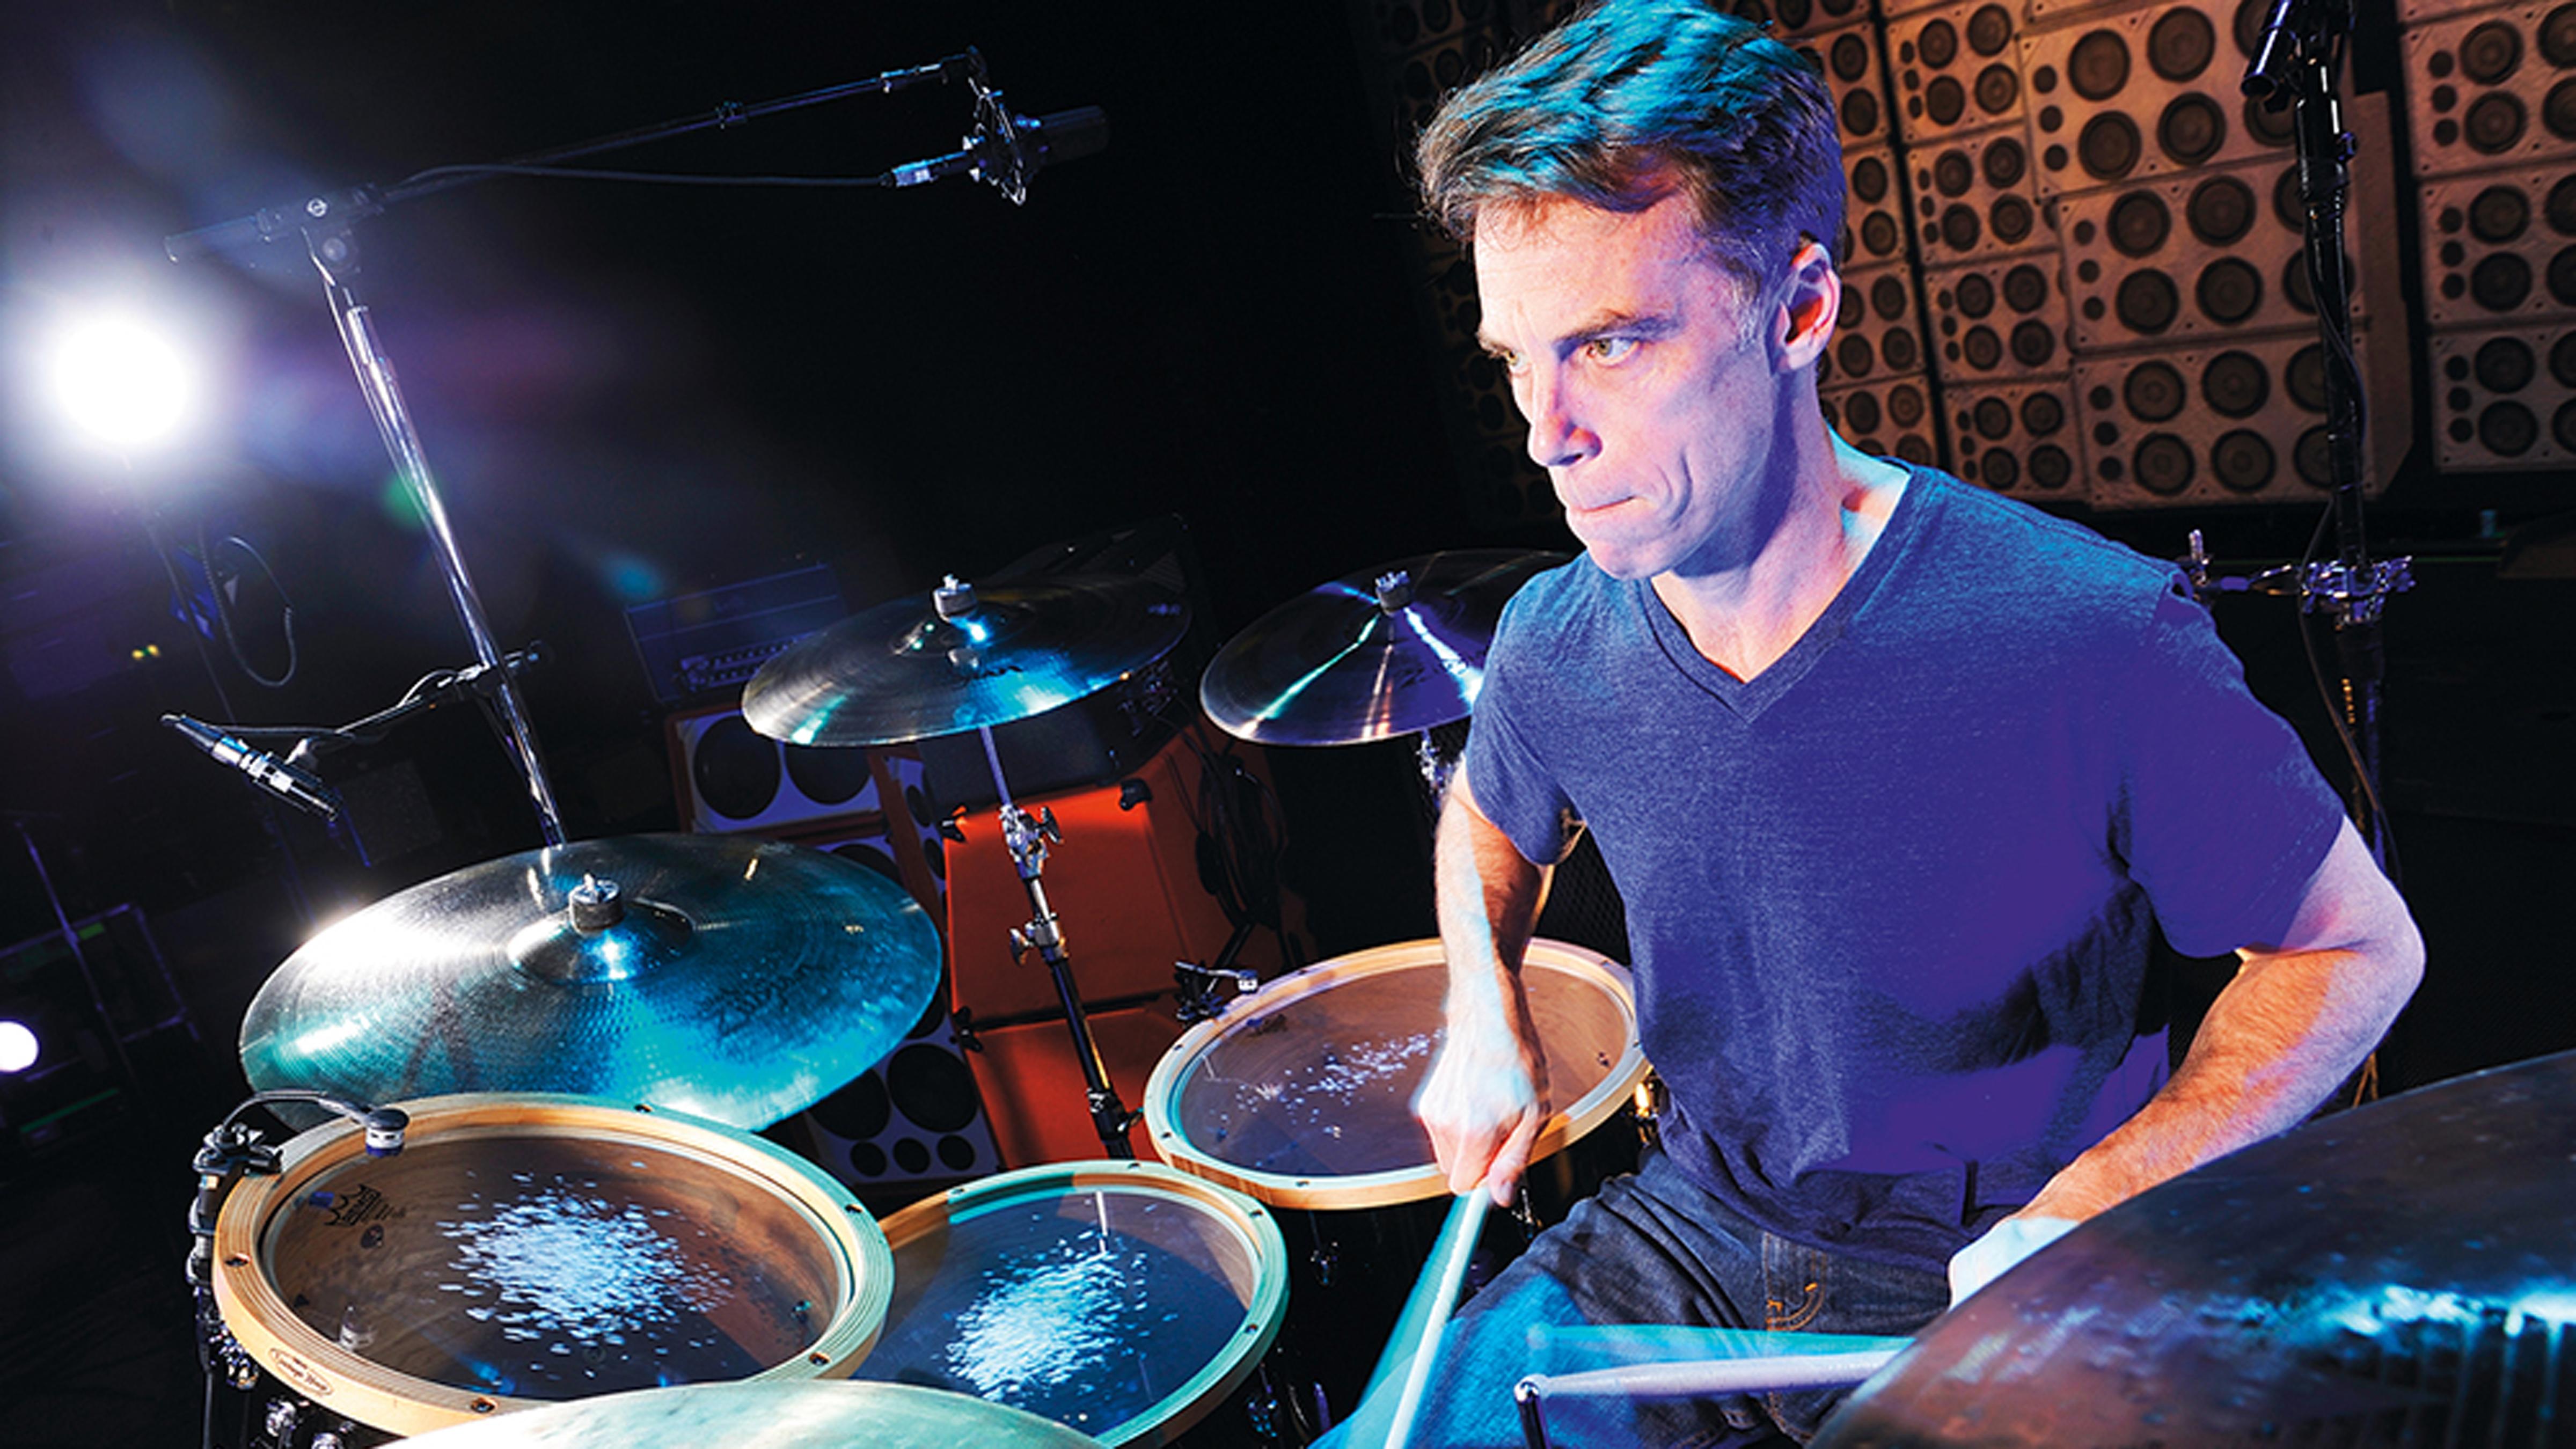 ¡Matt Cameron debuta como solista! Escucha su primer adelanto